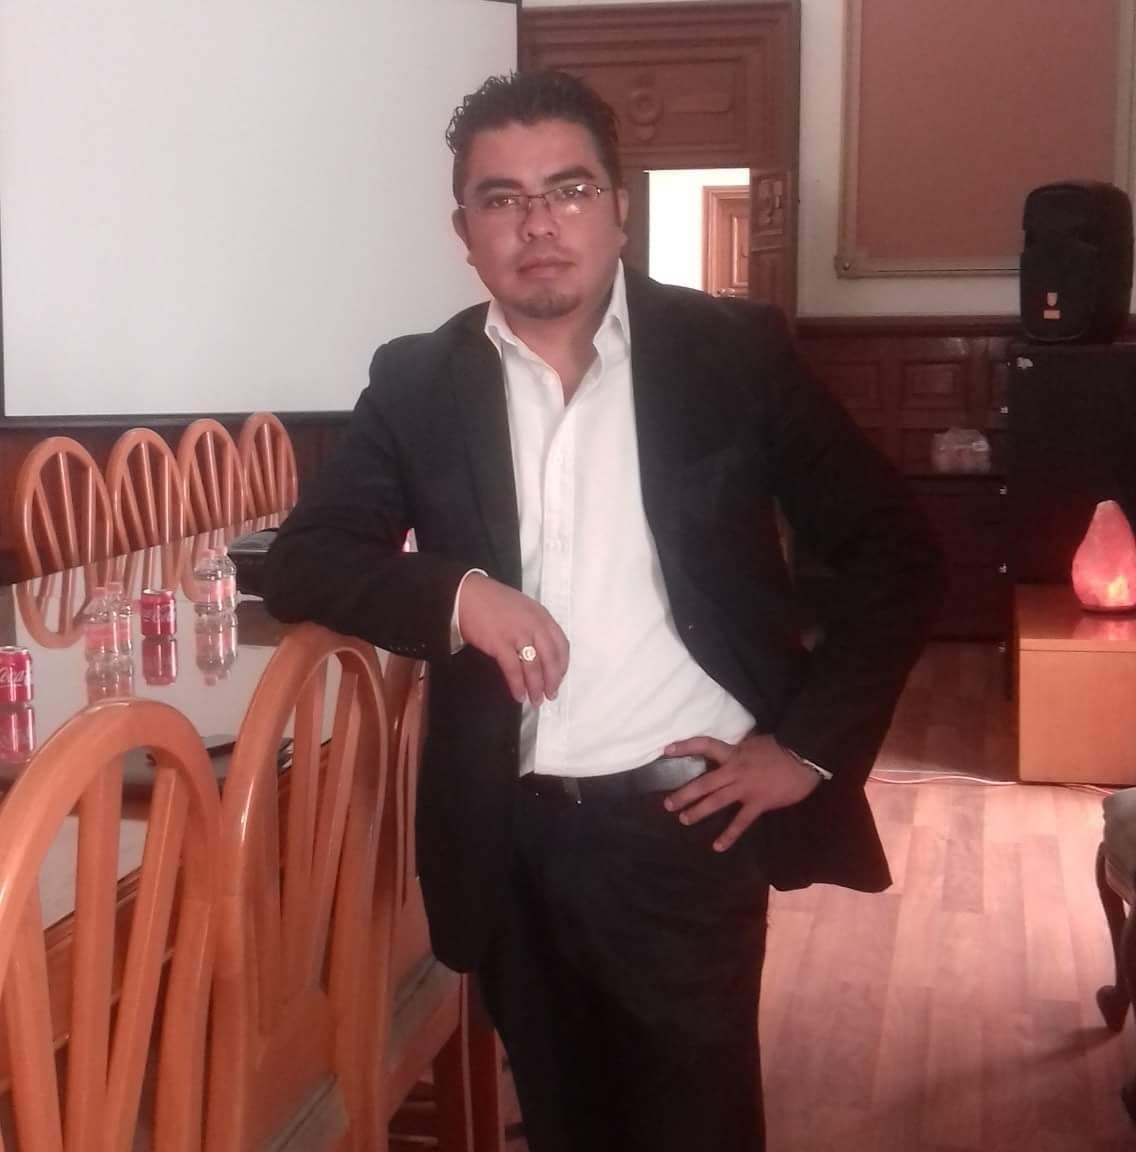 Representante distrital de Morena, acusado de fraude